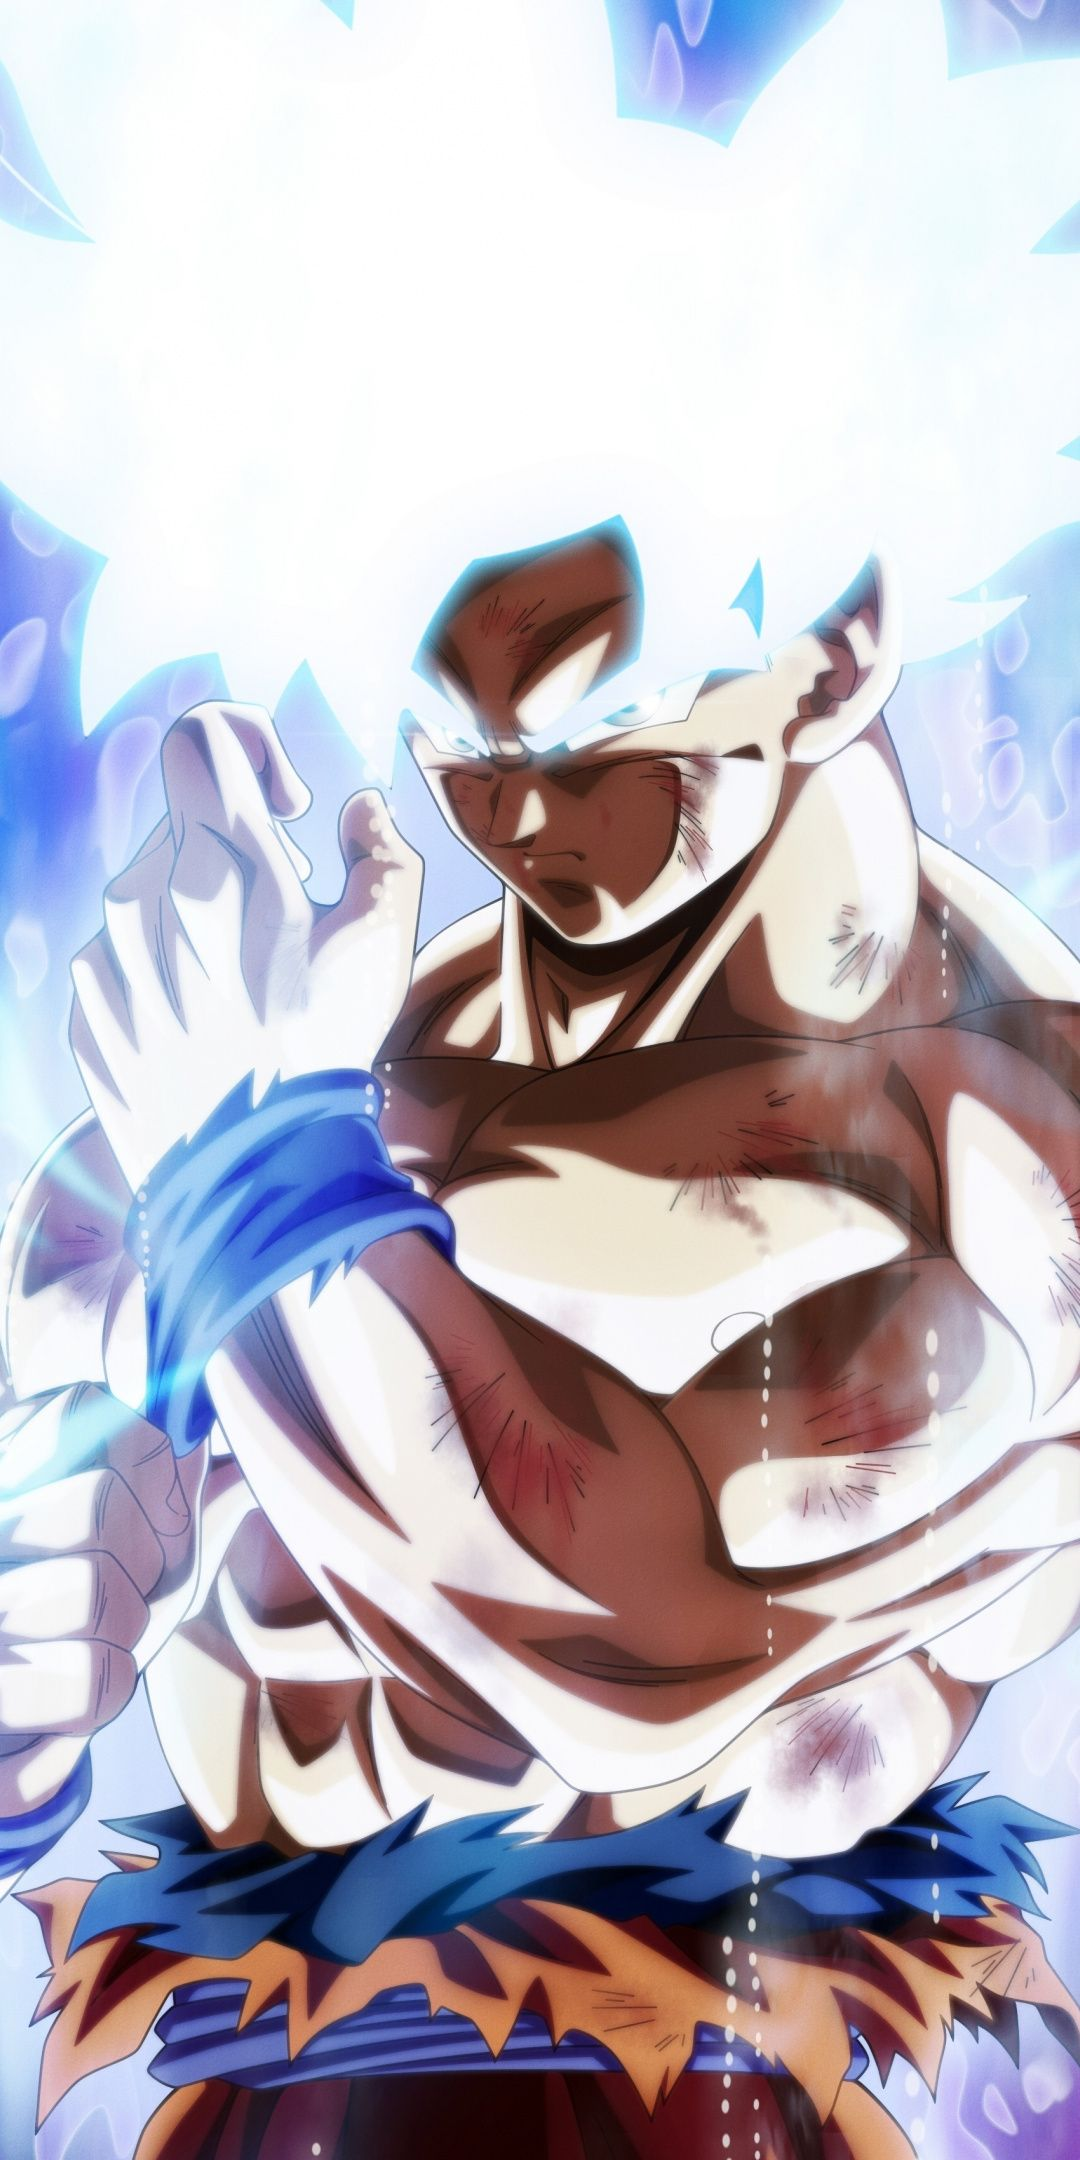 Download 1080x2160 Wallpaper Glow Goku Dragon Ball Super Anime Art Honor 7x Dragon Ball Super Artwork Dragon Ball Super Wallpapers Anime Dragon Ball Super